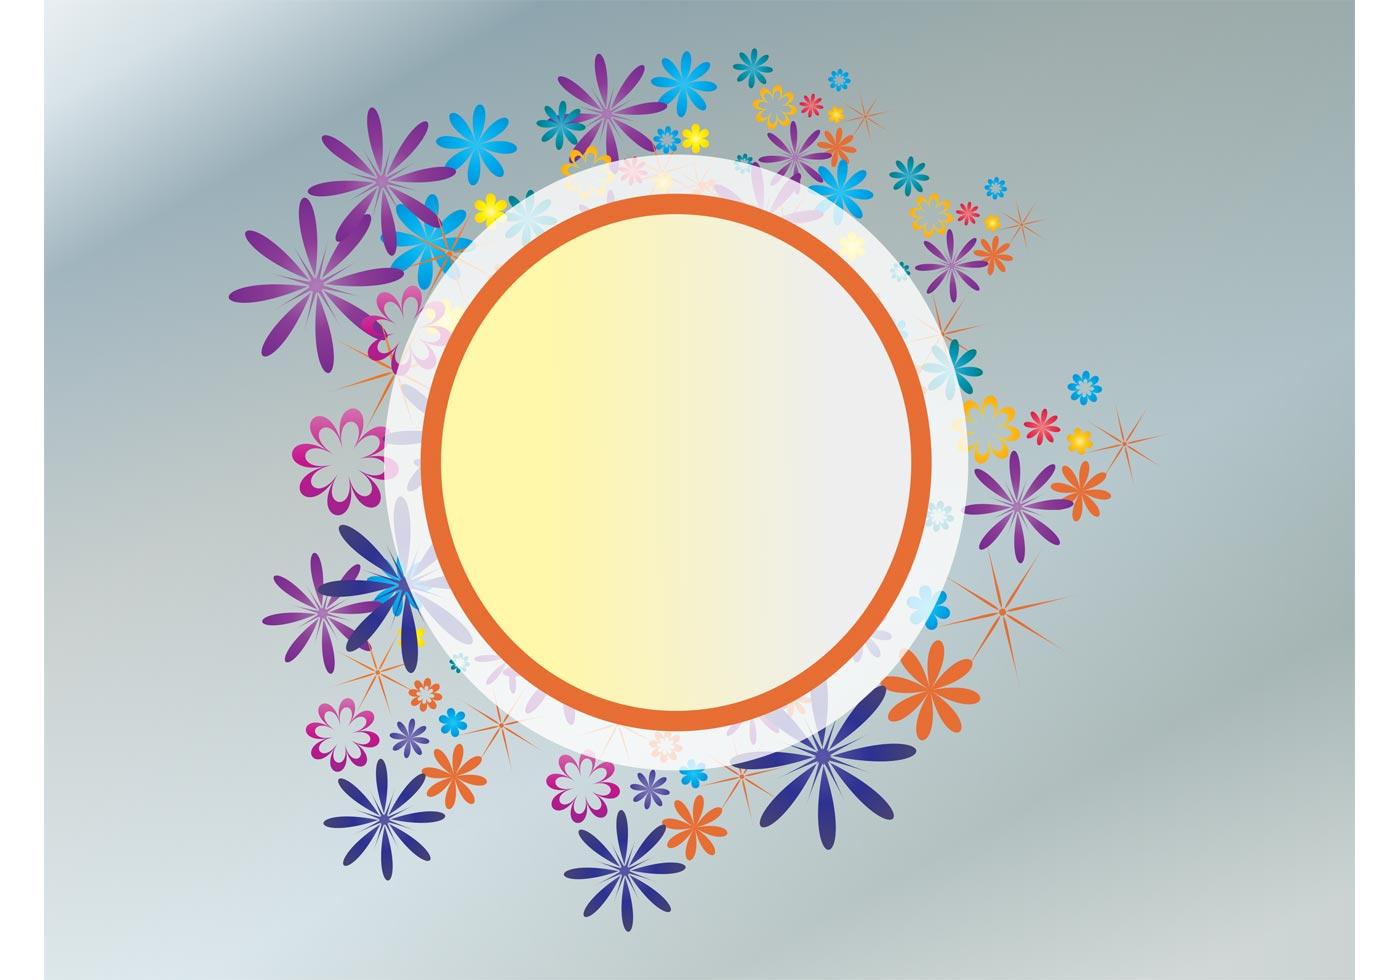 floral circle free vector art